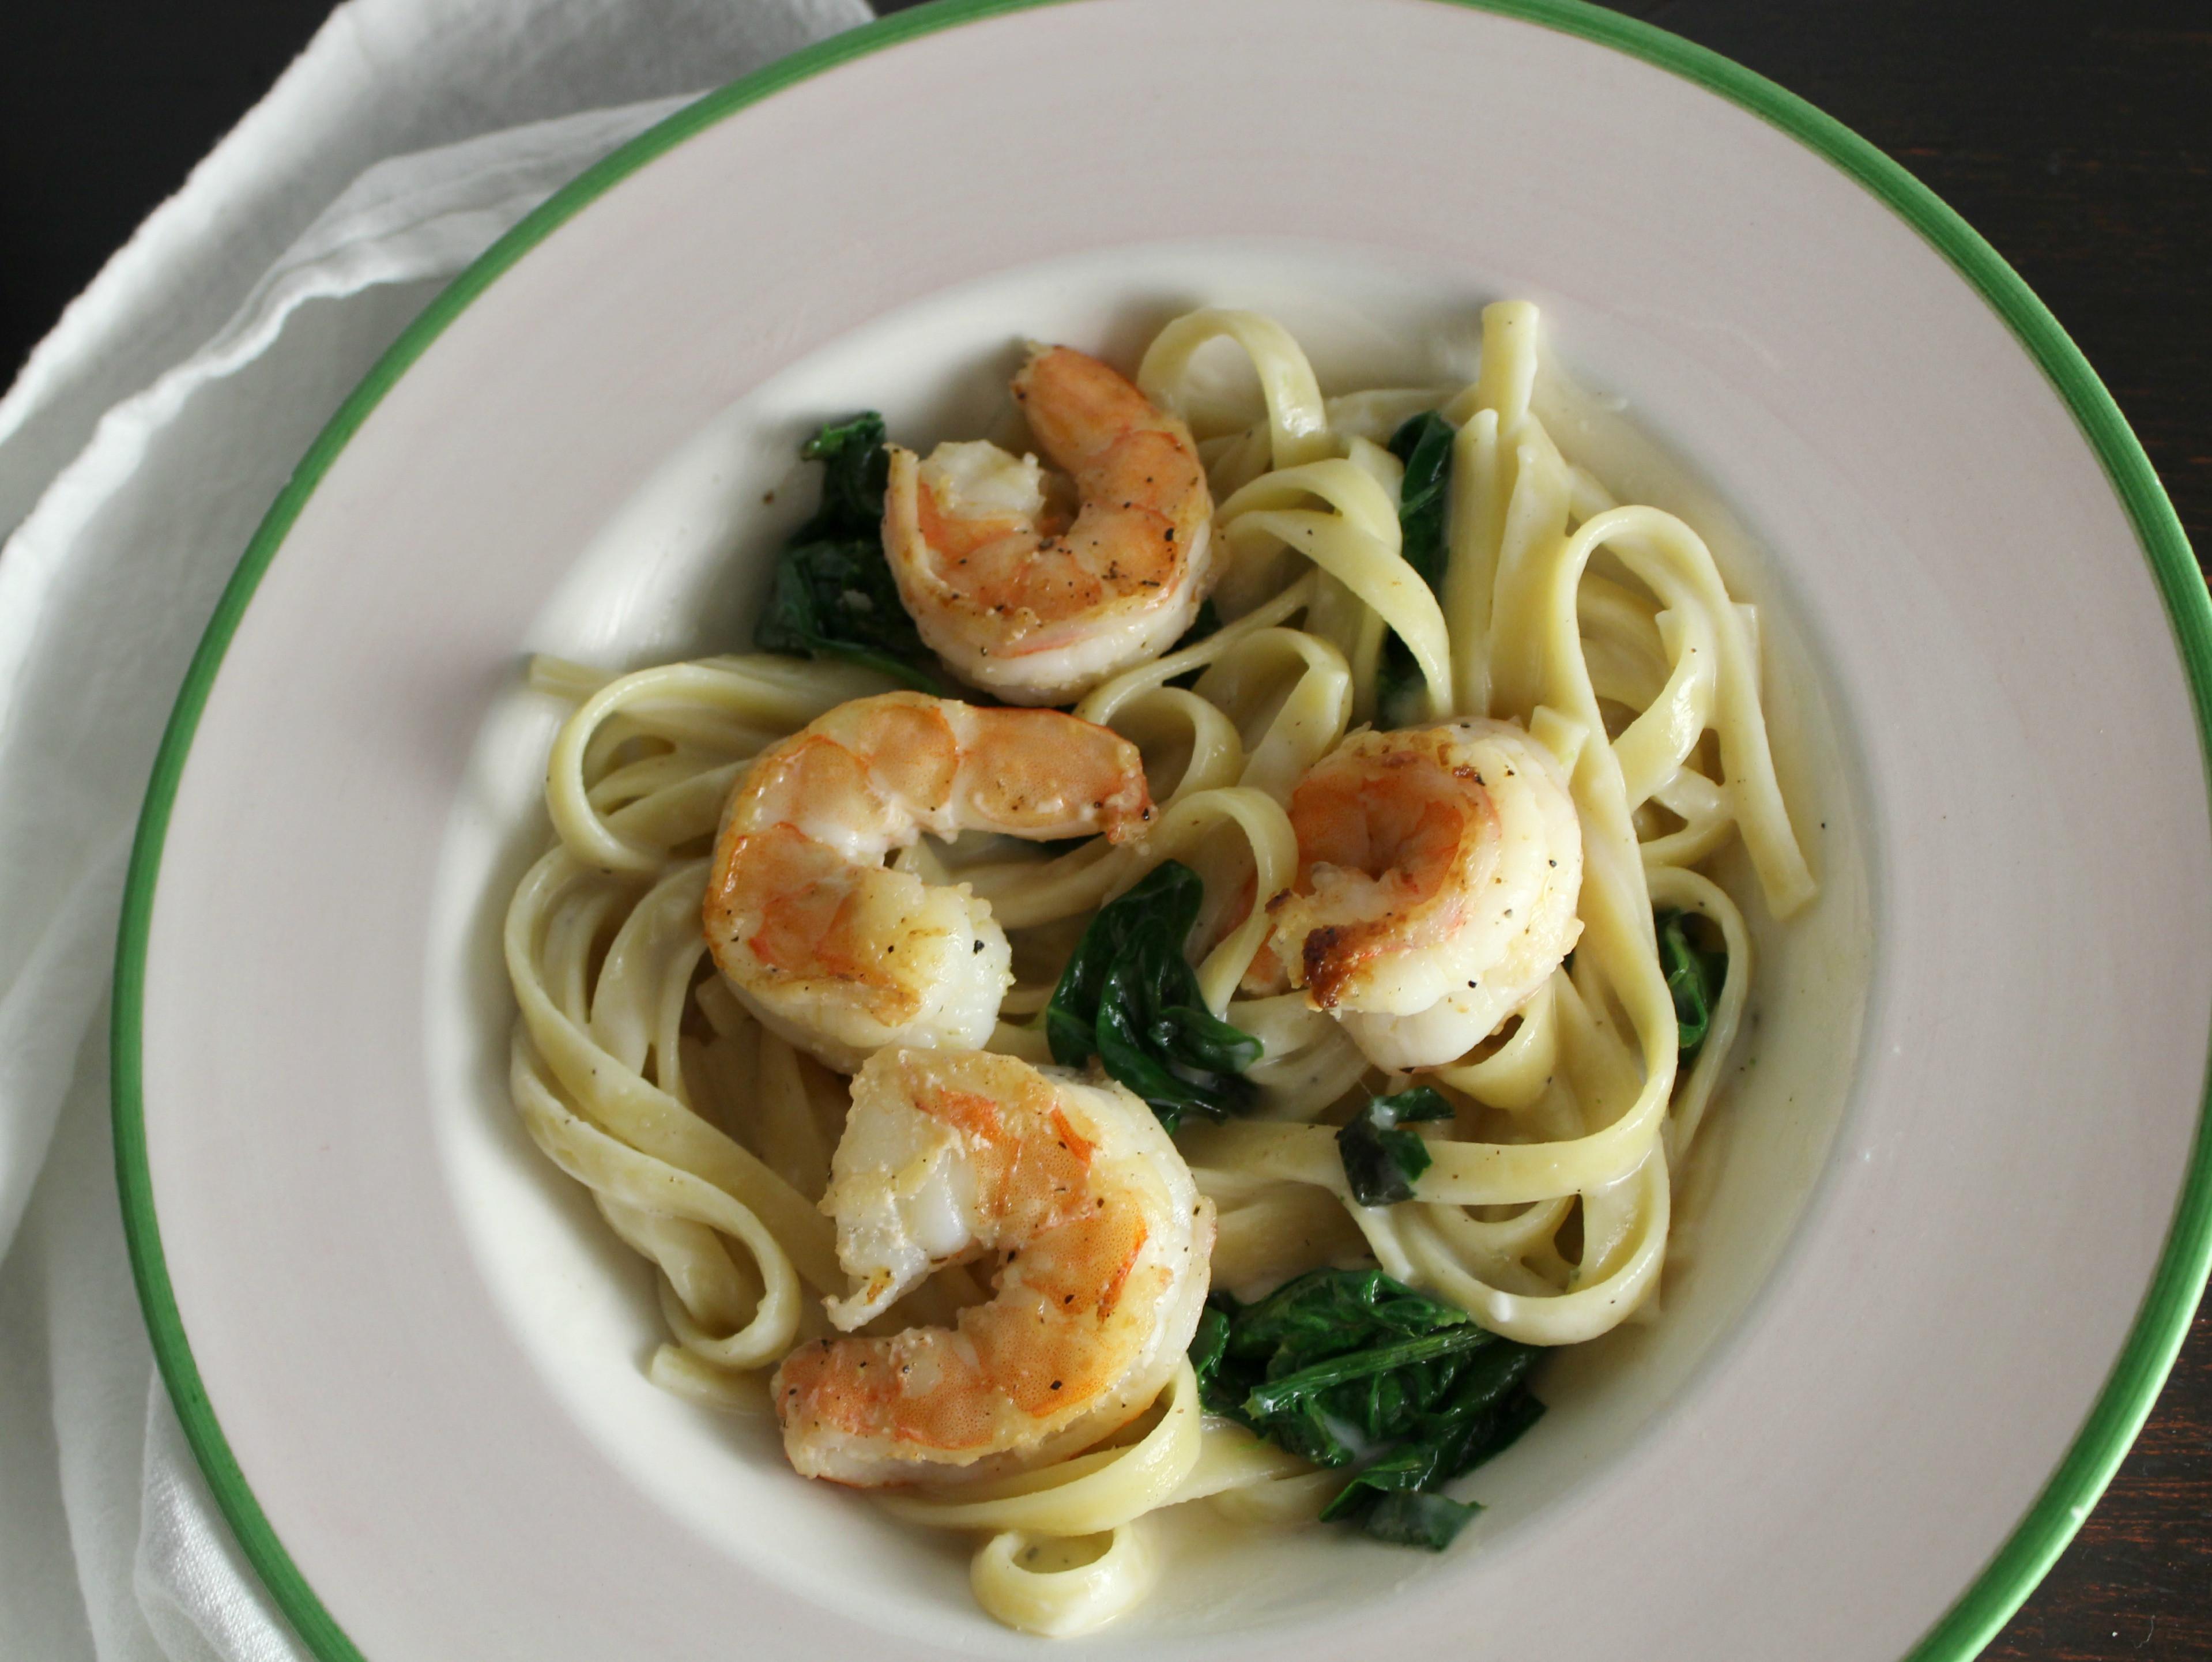 Shrimp And Spinach Pasta  Creamy Garlic Spinach and Shrimp Pasta Petit Foo